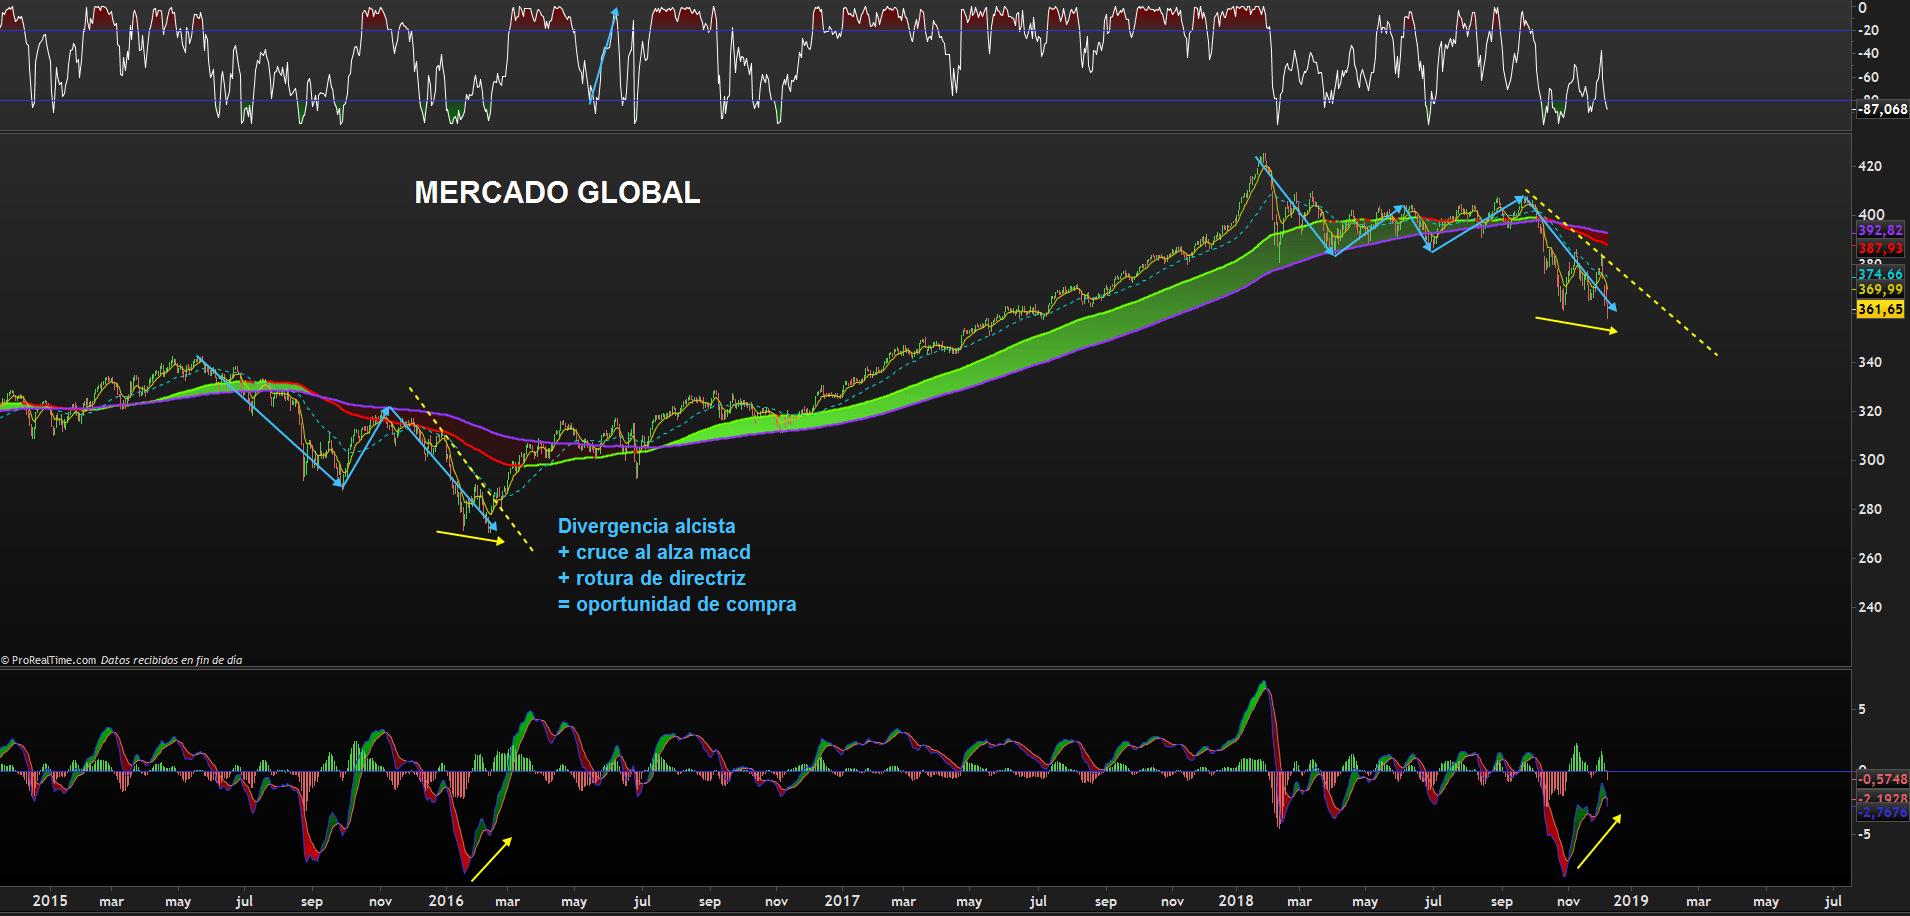 mercado-global-divergencia.png